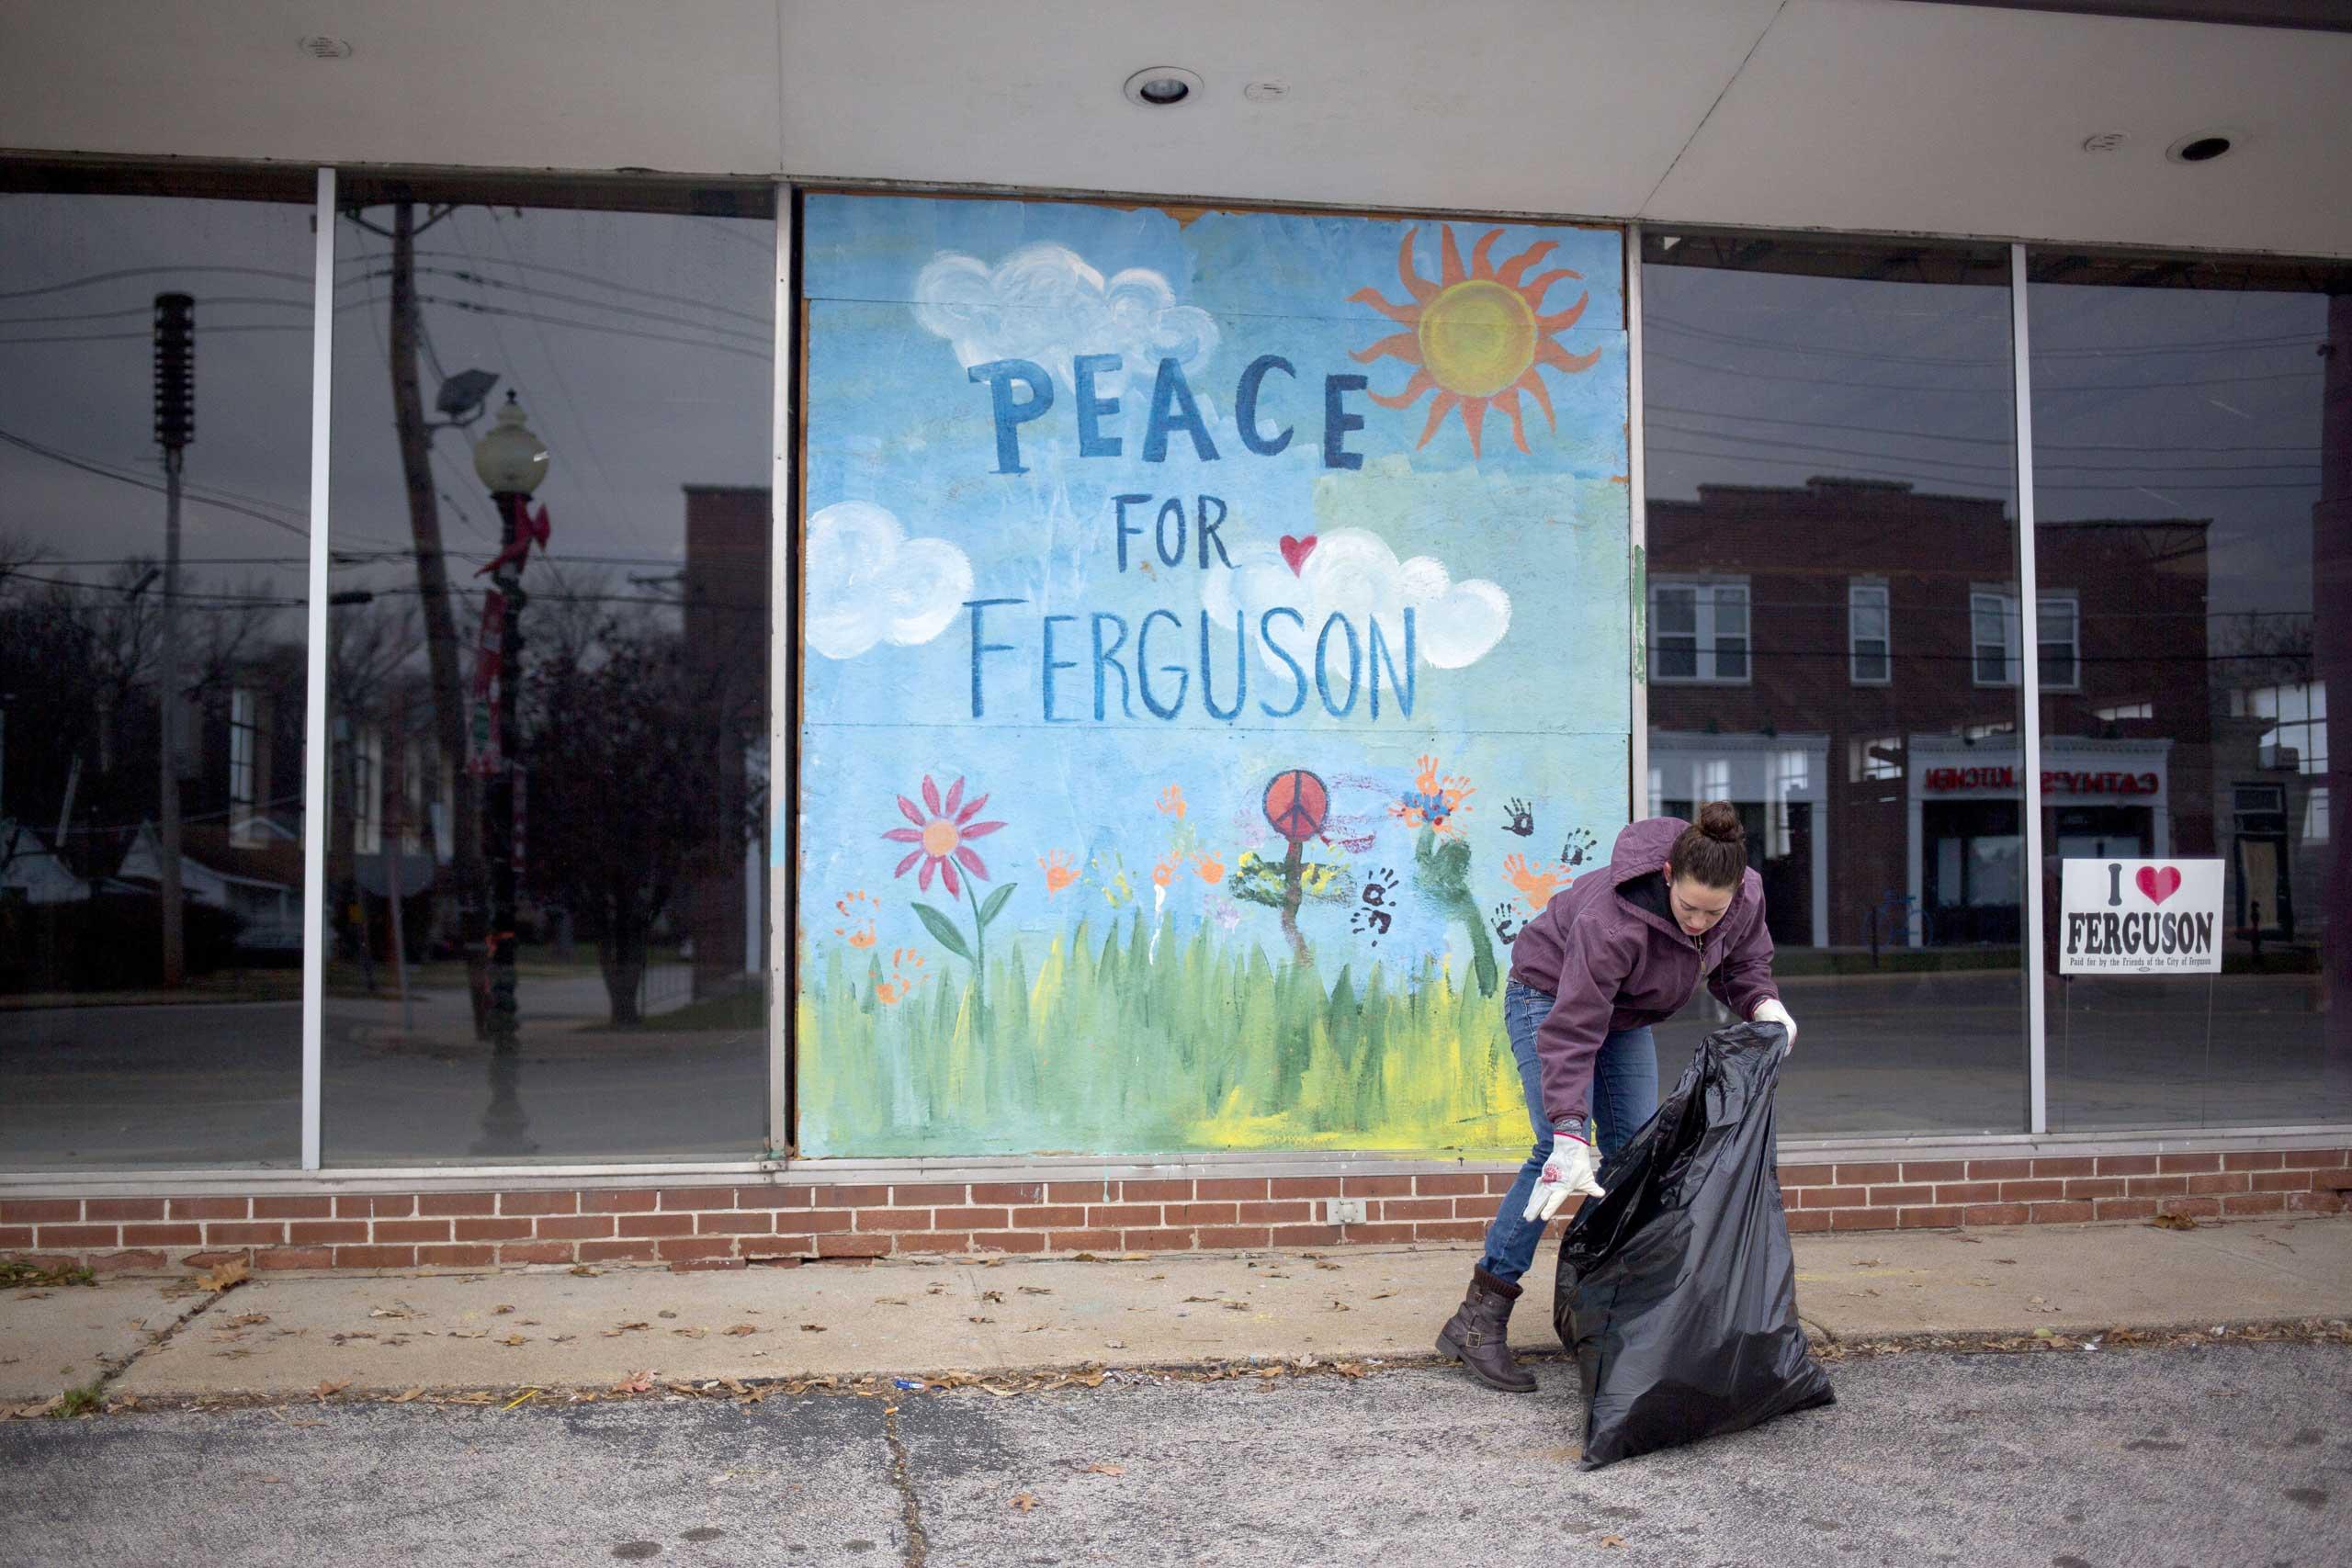 Jodi Wurm helps to  clean up after violent protests damaged businesses in Ferguson, Mo., Nov. 25, 2014.